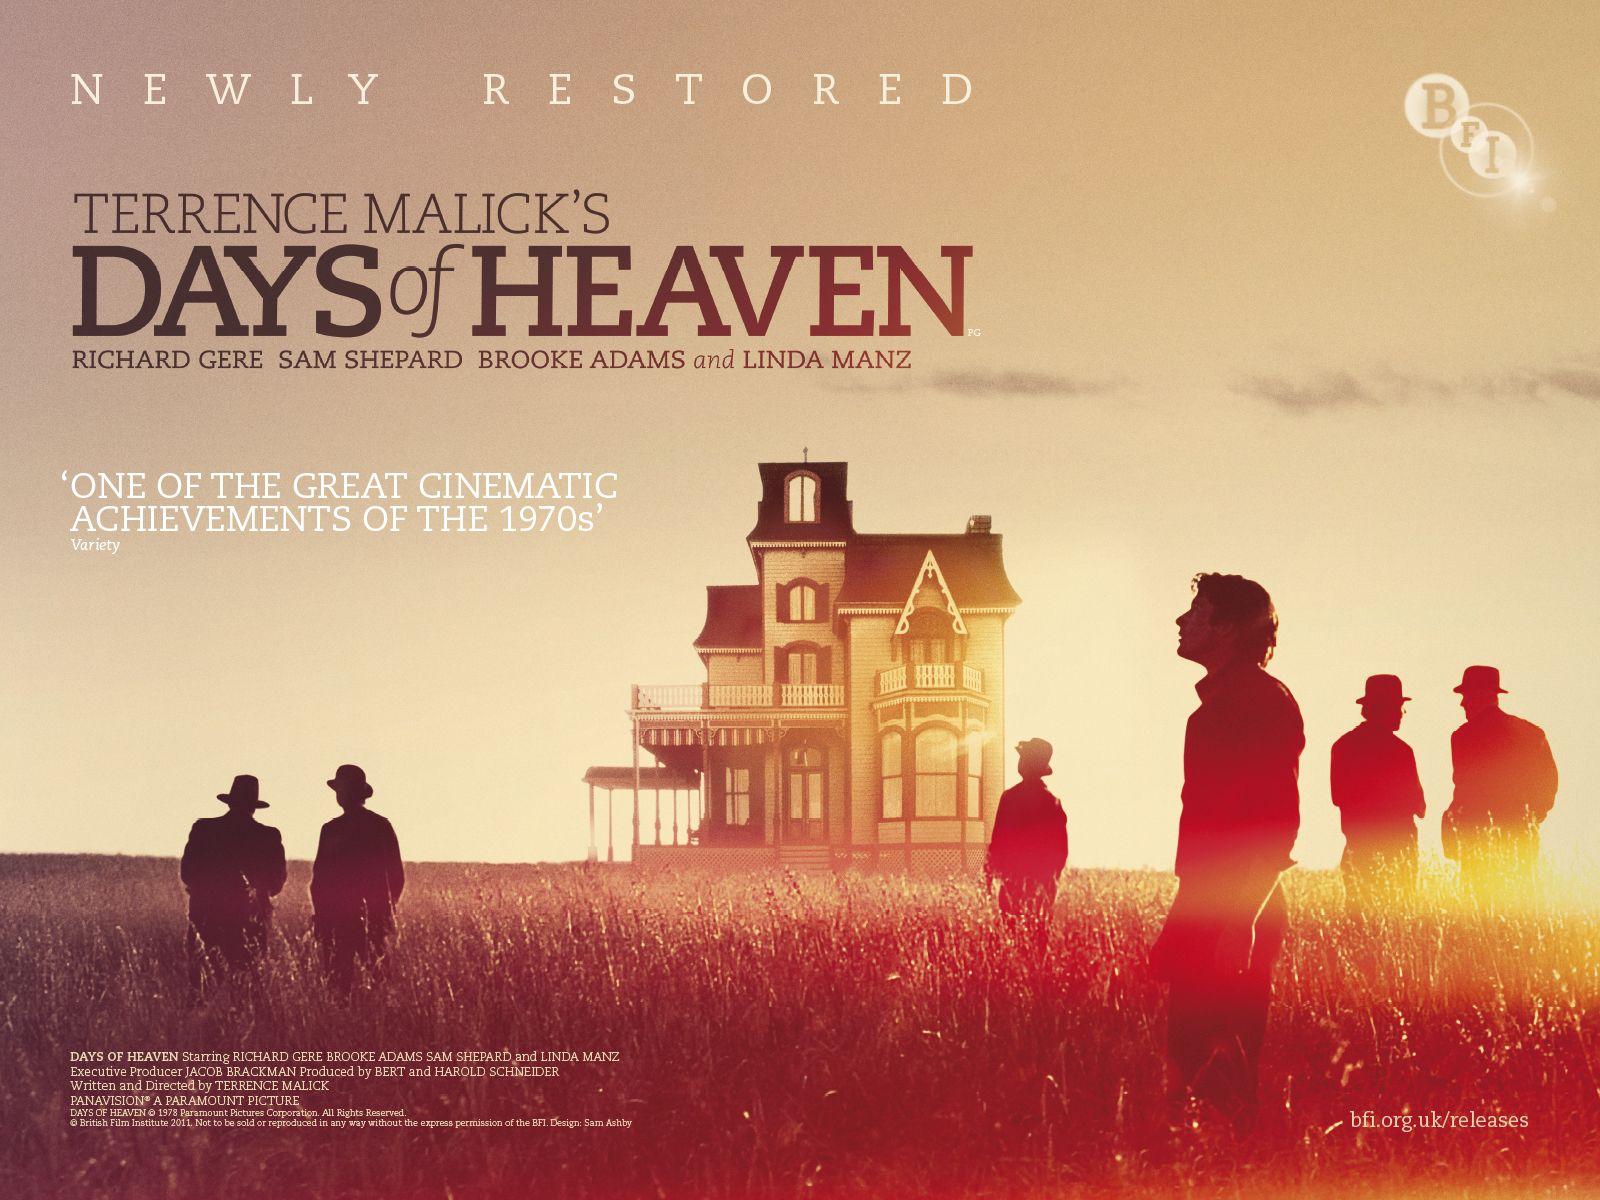 Days of Heaven (Terrence Malick, 1974) | Heaven movie, Beautiful film